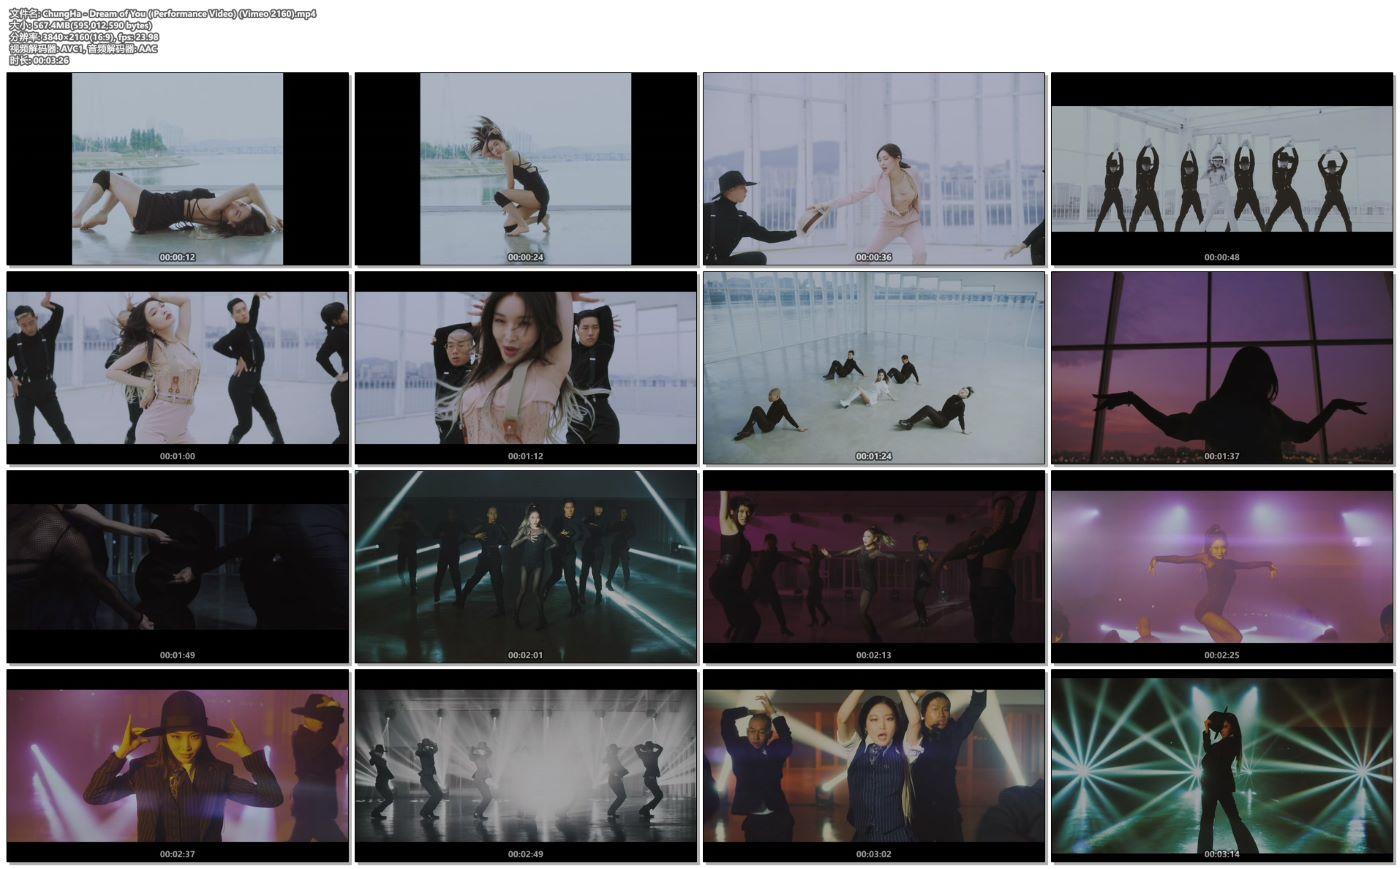 ChungHa - Dream of You ( Performance Video)